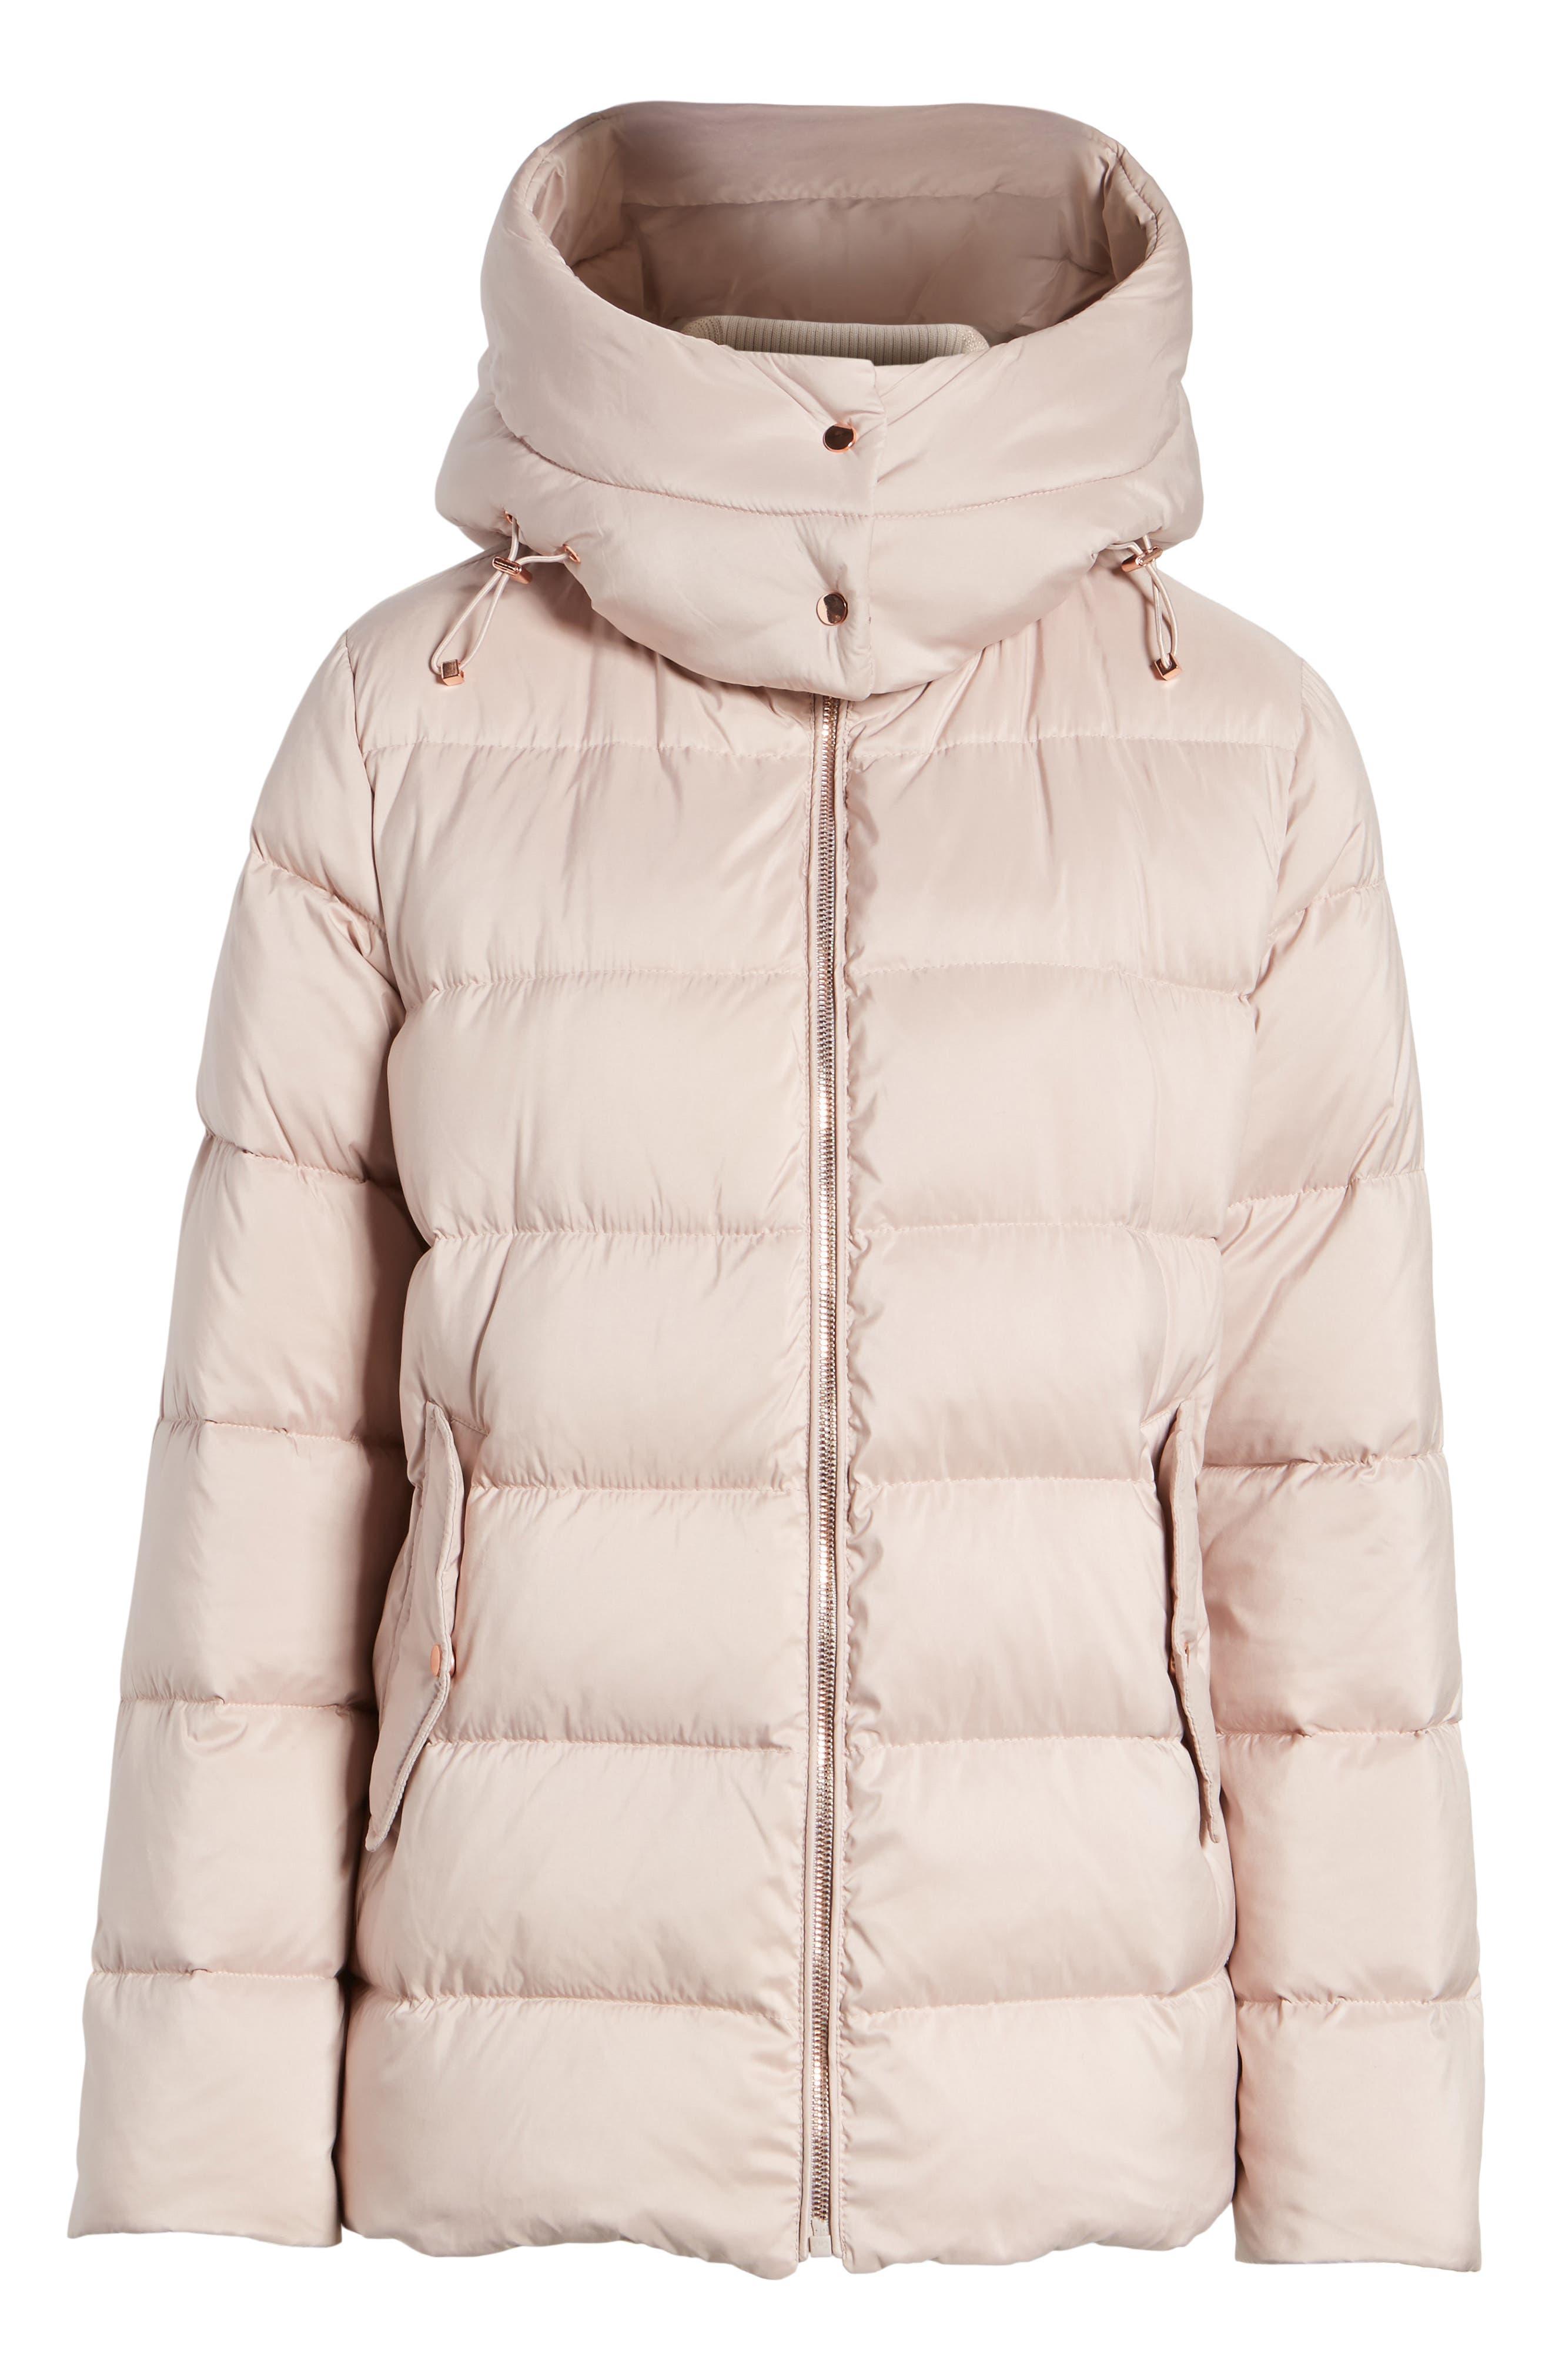 Hooded Puffer Jacket,                             Alternate thumbnail 7, color,                             Petal Pink